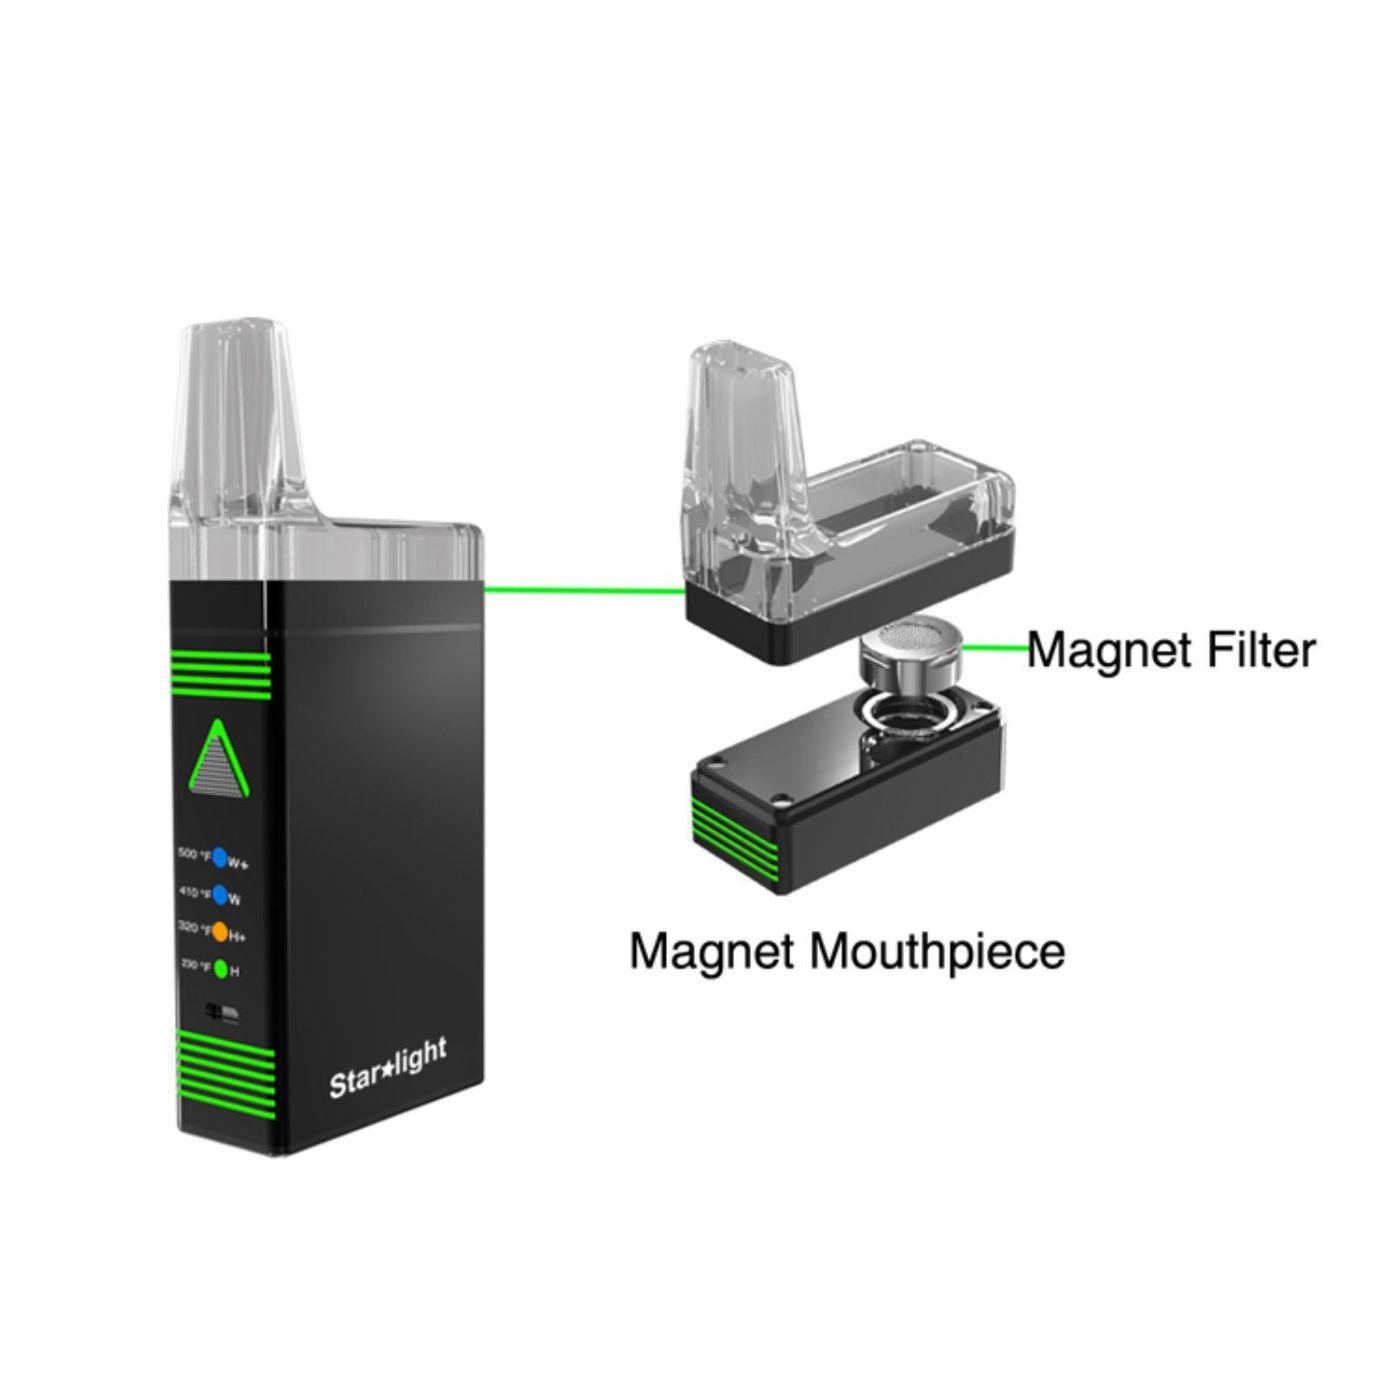 Starlight vaporizer magnet filter